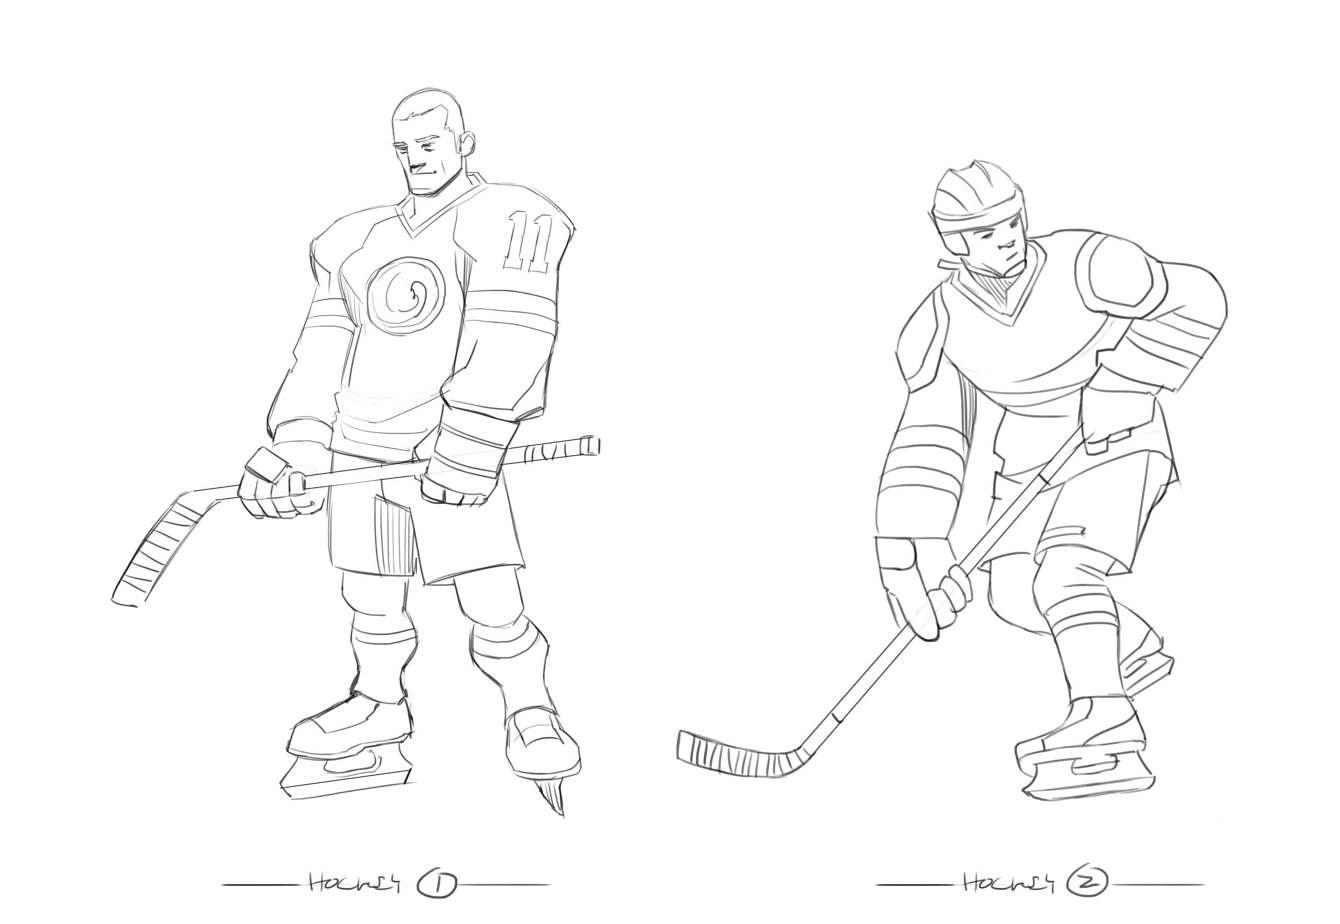 sports-character-design-Hockey_1340_c.jpg